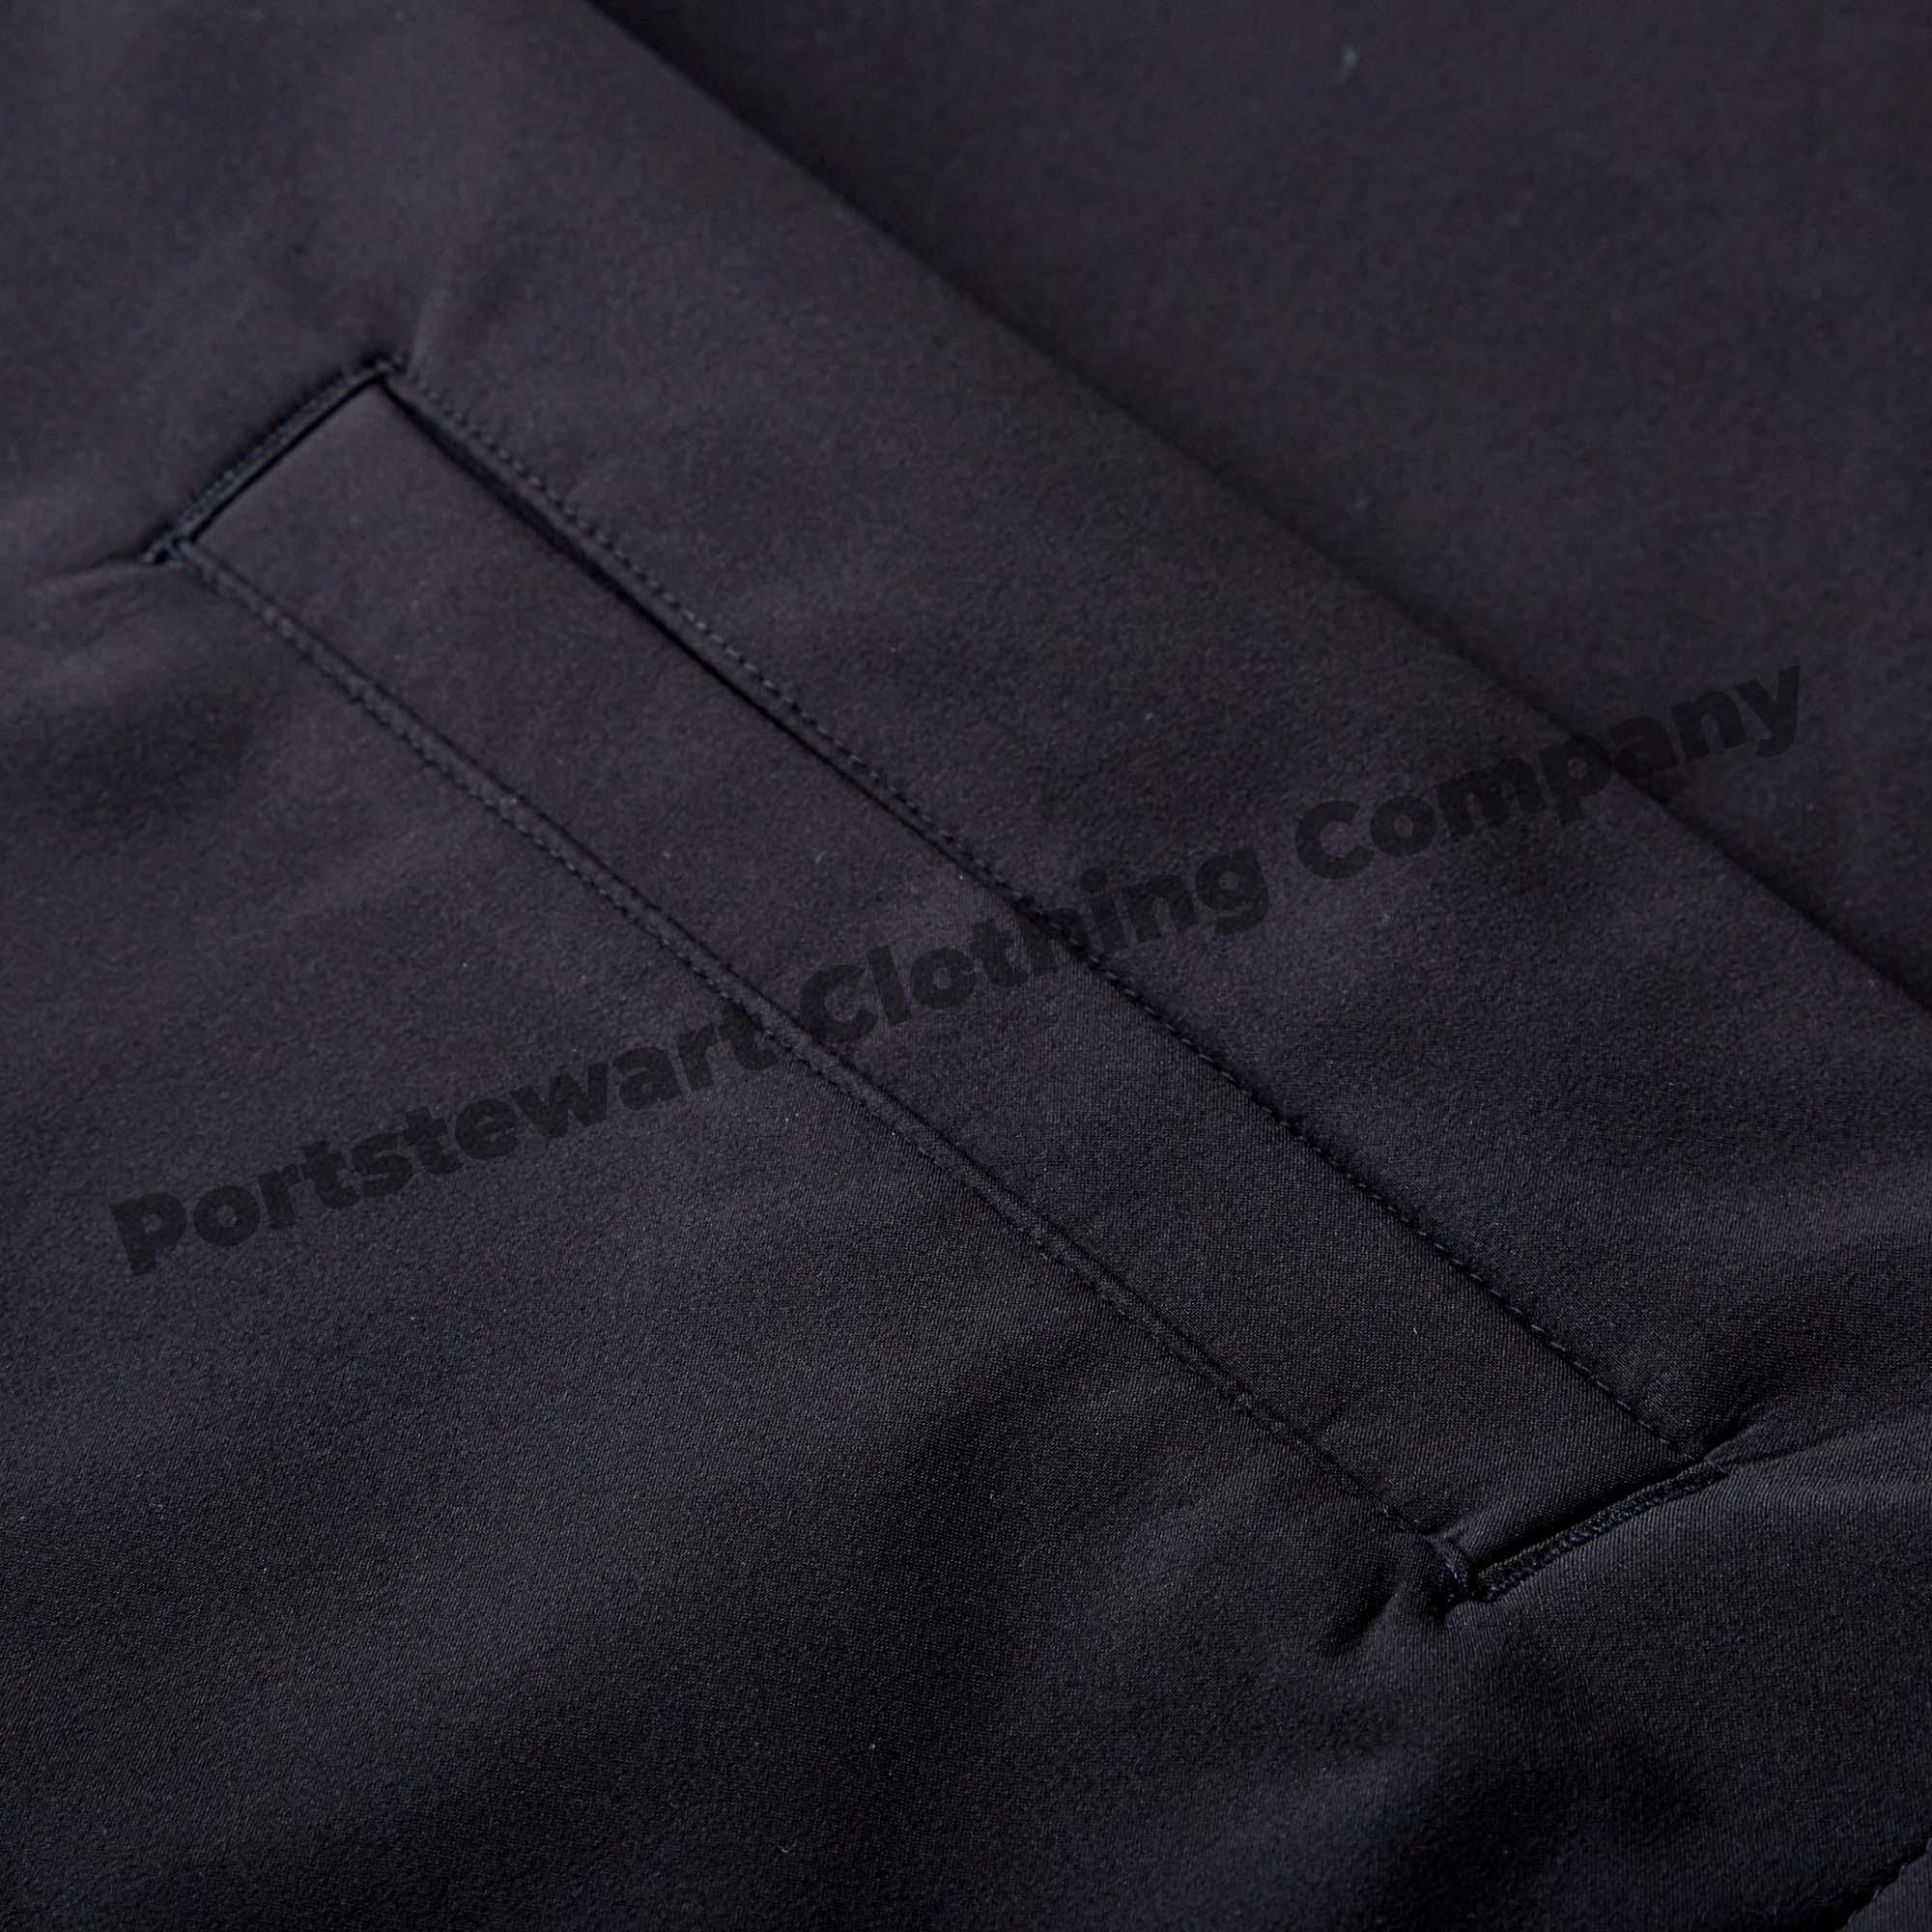 Regatta-Mens-Soft-Shell-Windproof-Workwear-Softshell-Jacket-Coat-RRP-50 thumbnail 5